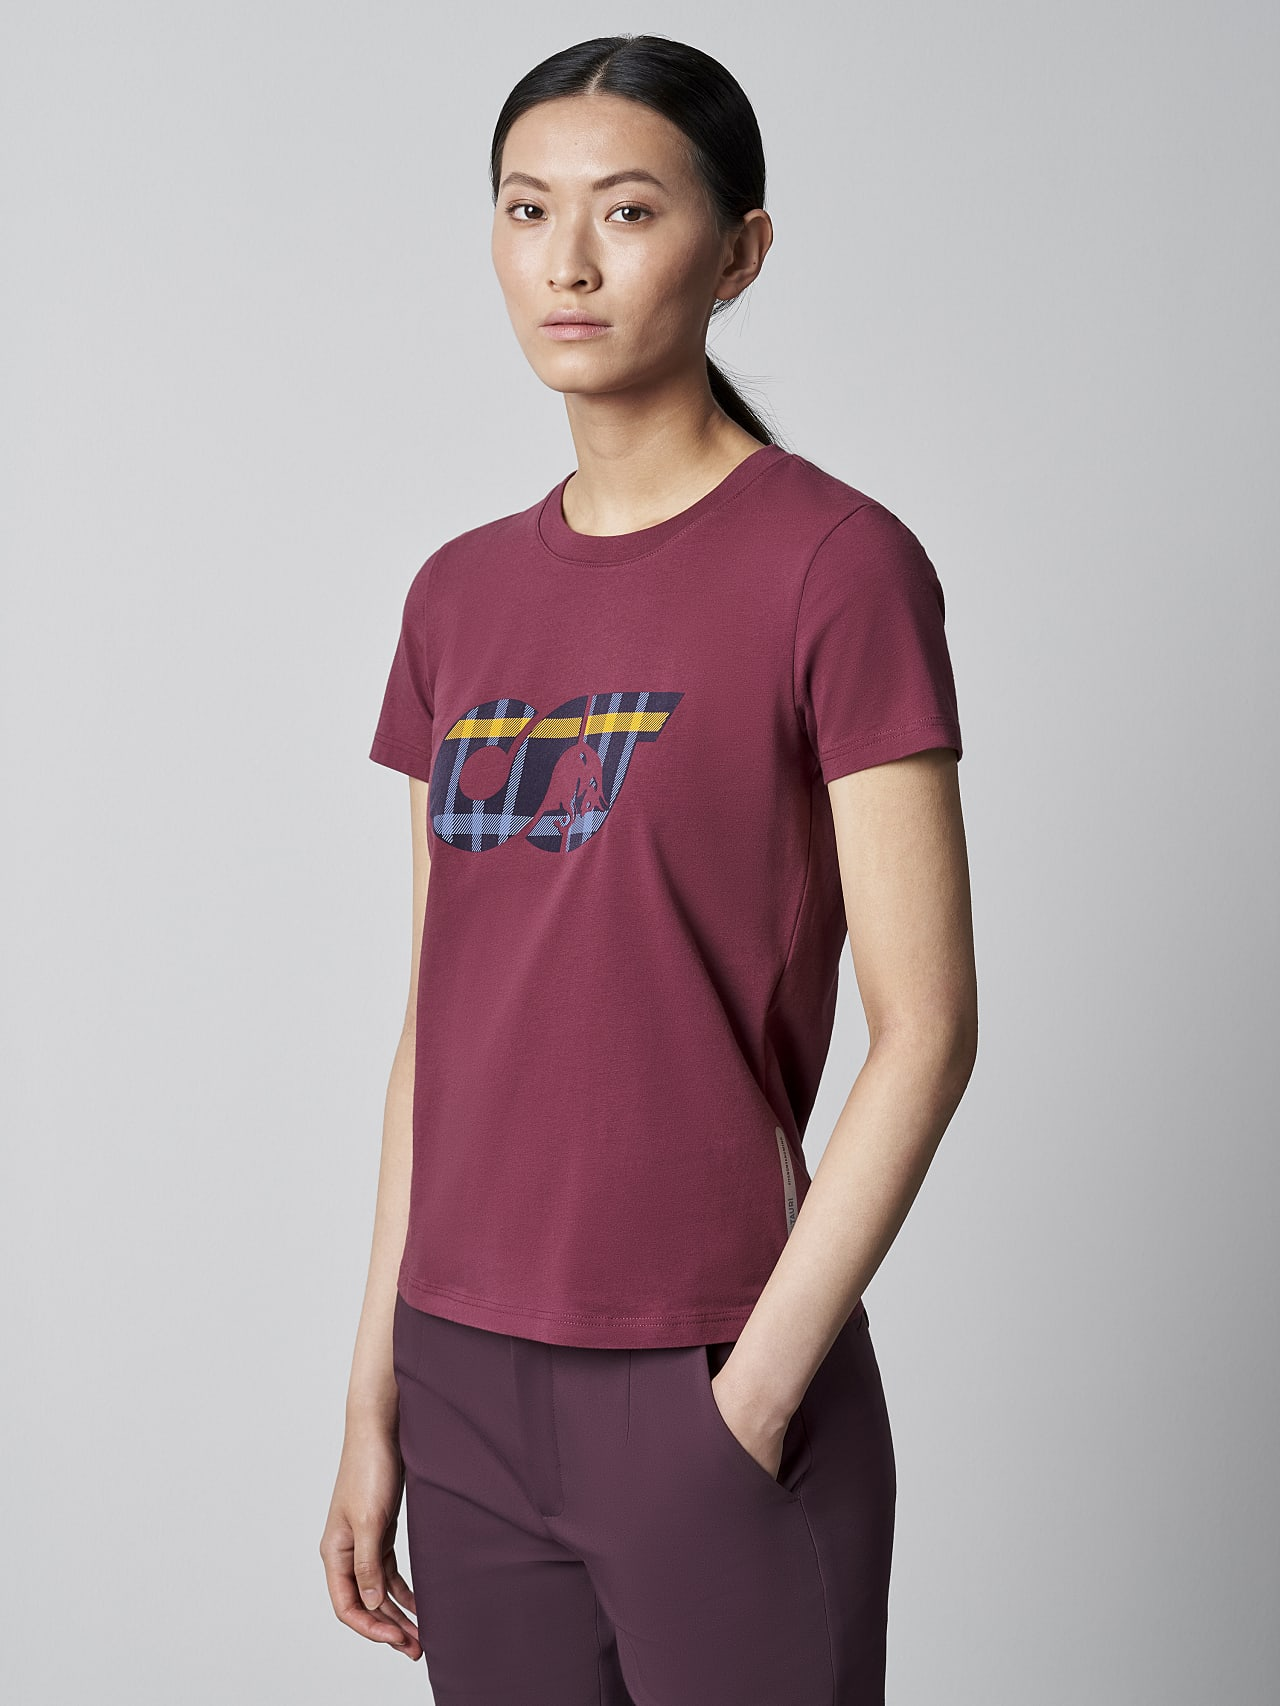 JANPA V1.Y5.02 Logo Print T-Shirt bordeaux Model shot Alpha Tauri